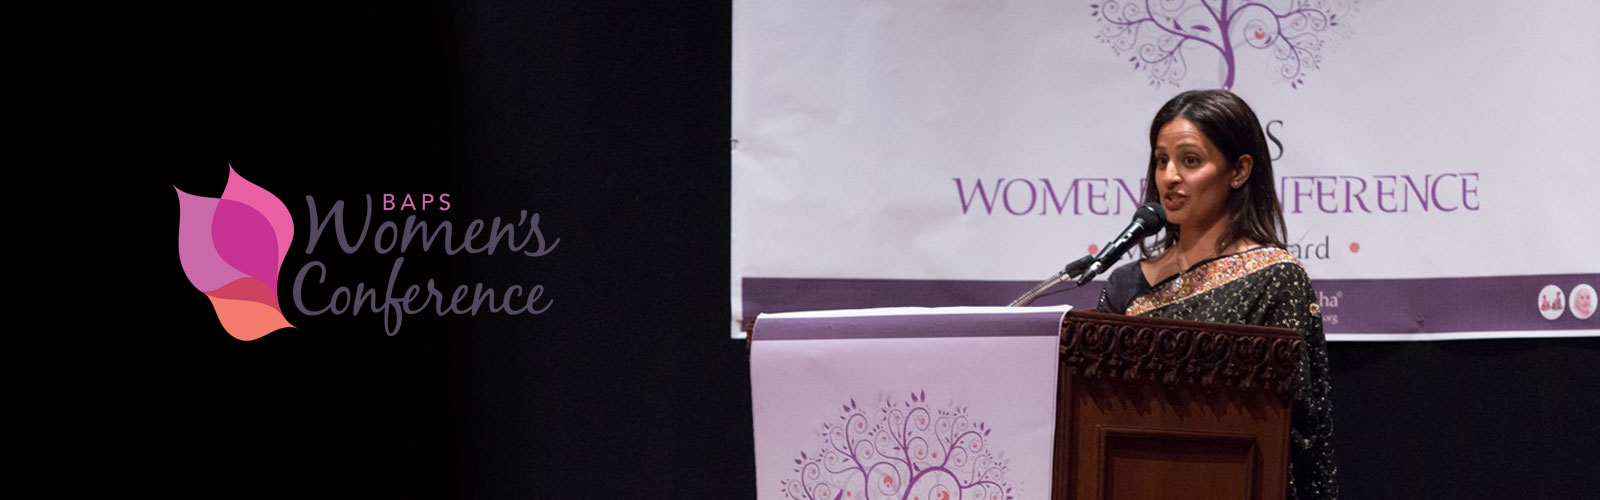 wc-banner01